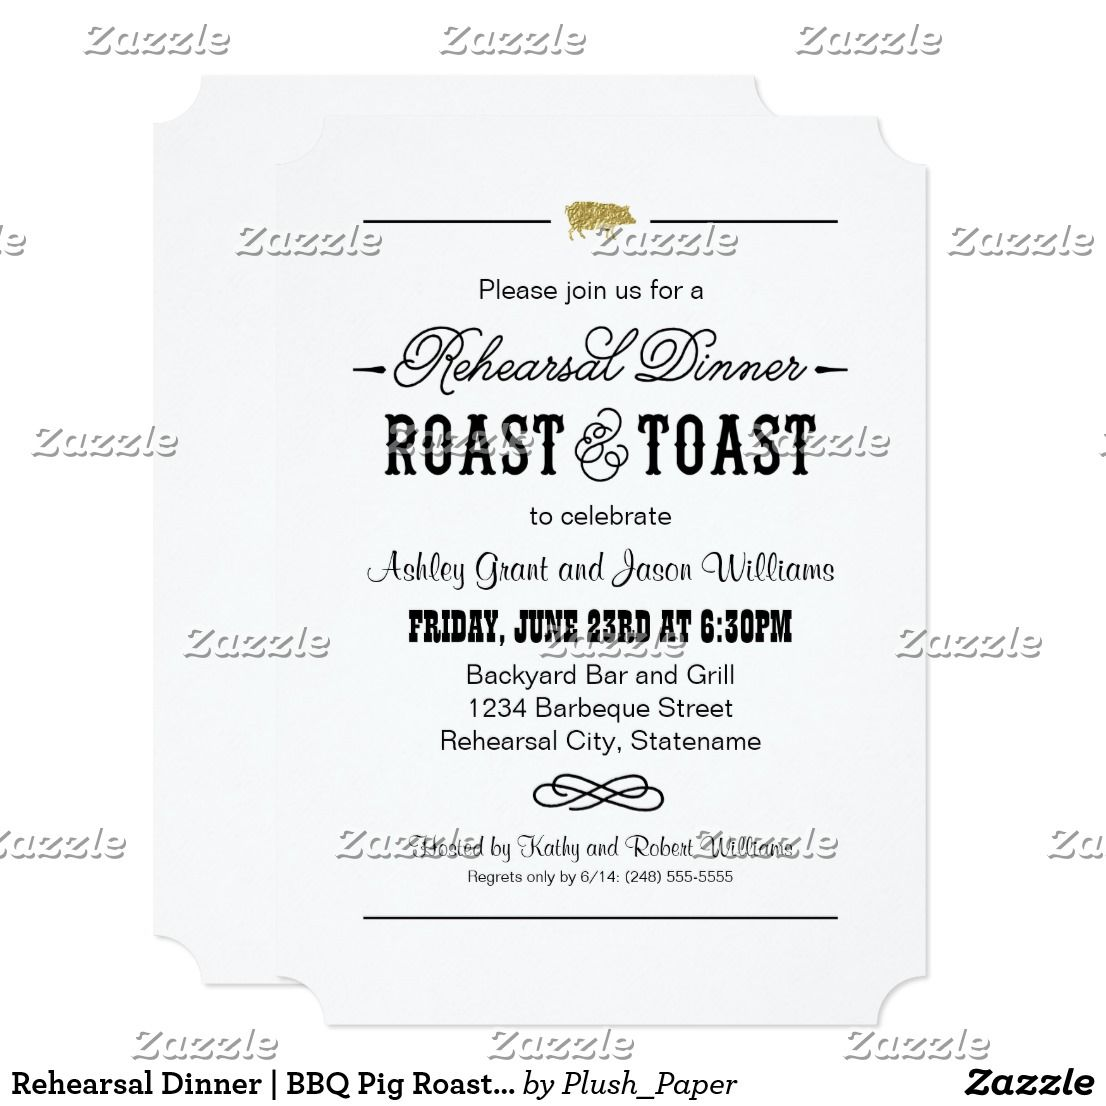 Rehearsal Dinner | BBQ Pig Roast and Toast Card | { Wedding ...